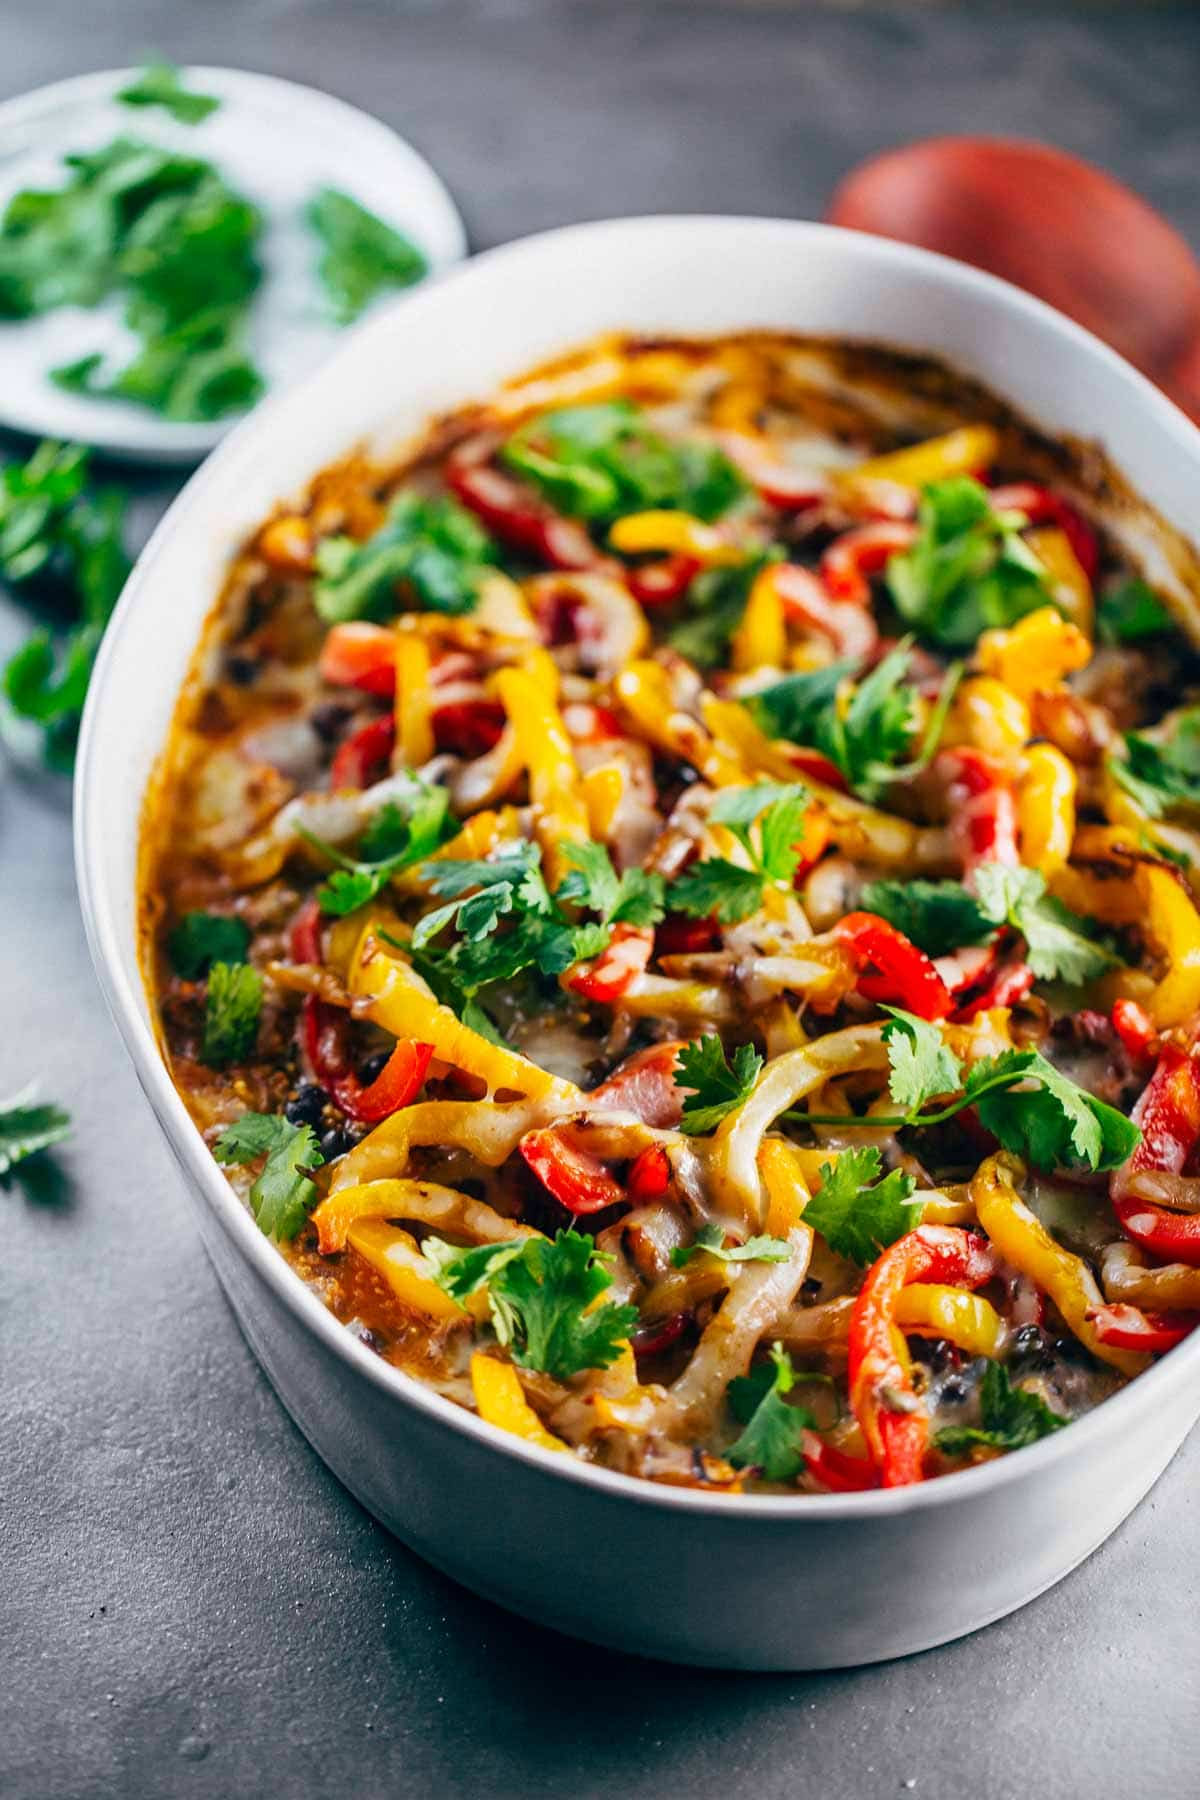 Easy Healthy Chicken Casseroles Recipes  Easy Mexican Chicken Quinoa Casserole Recipe Pinch of Yum